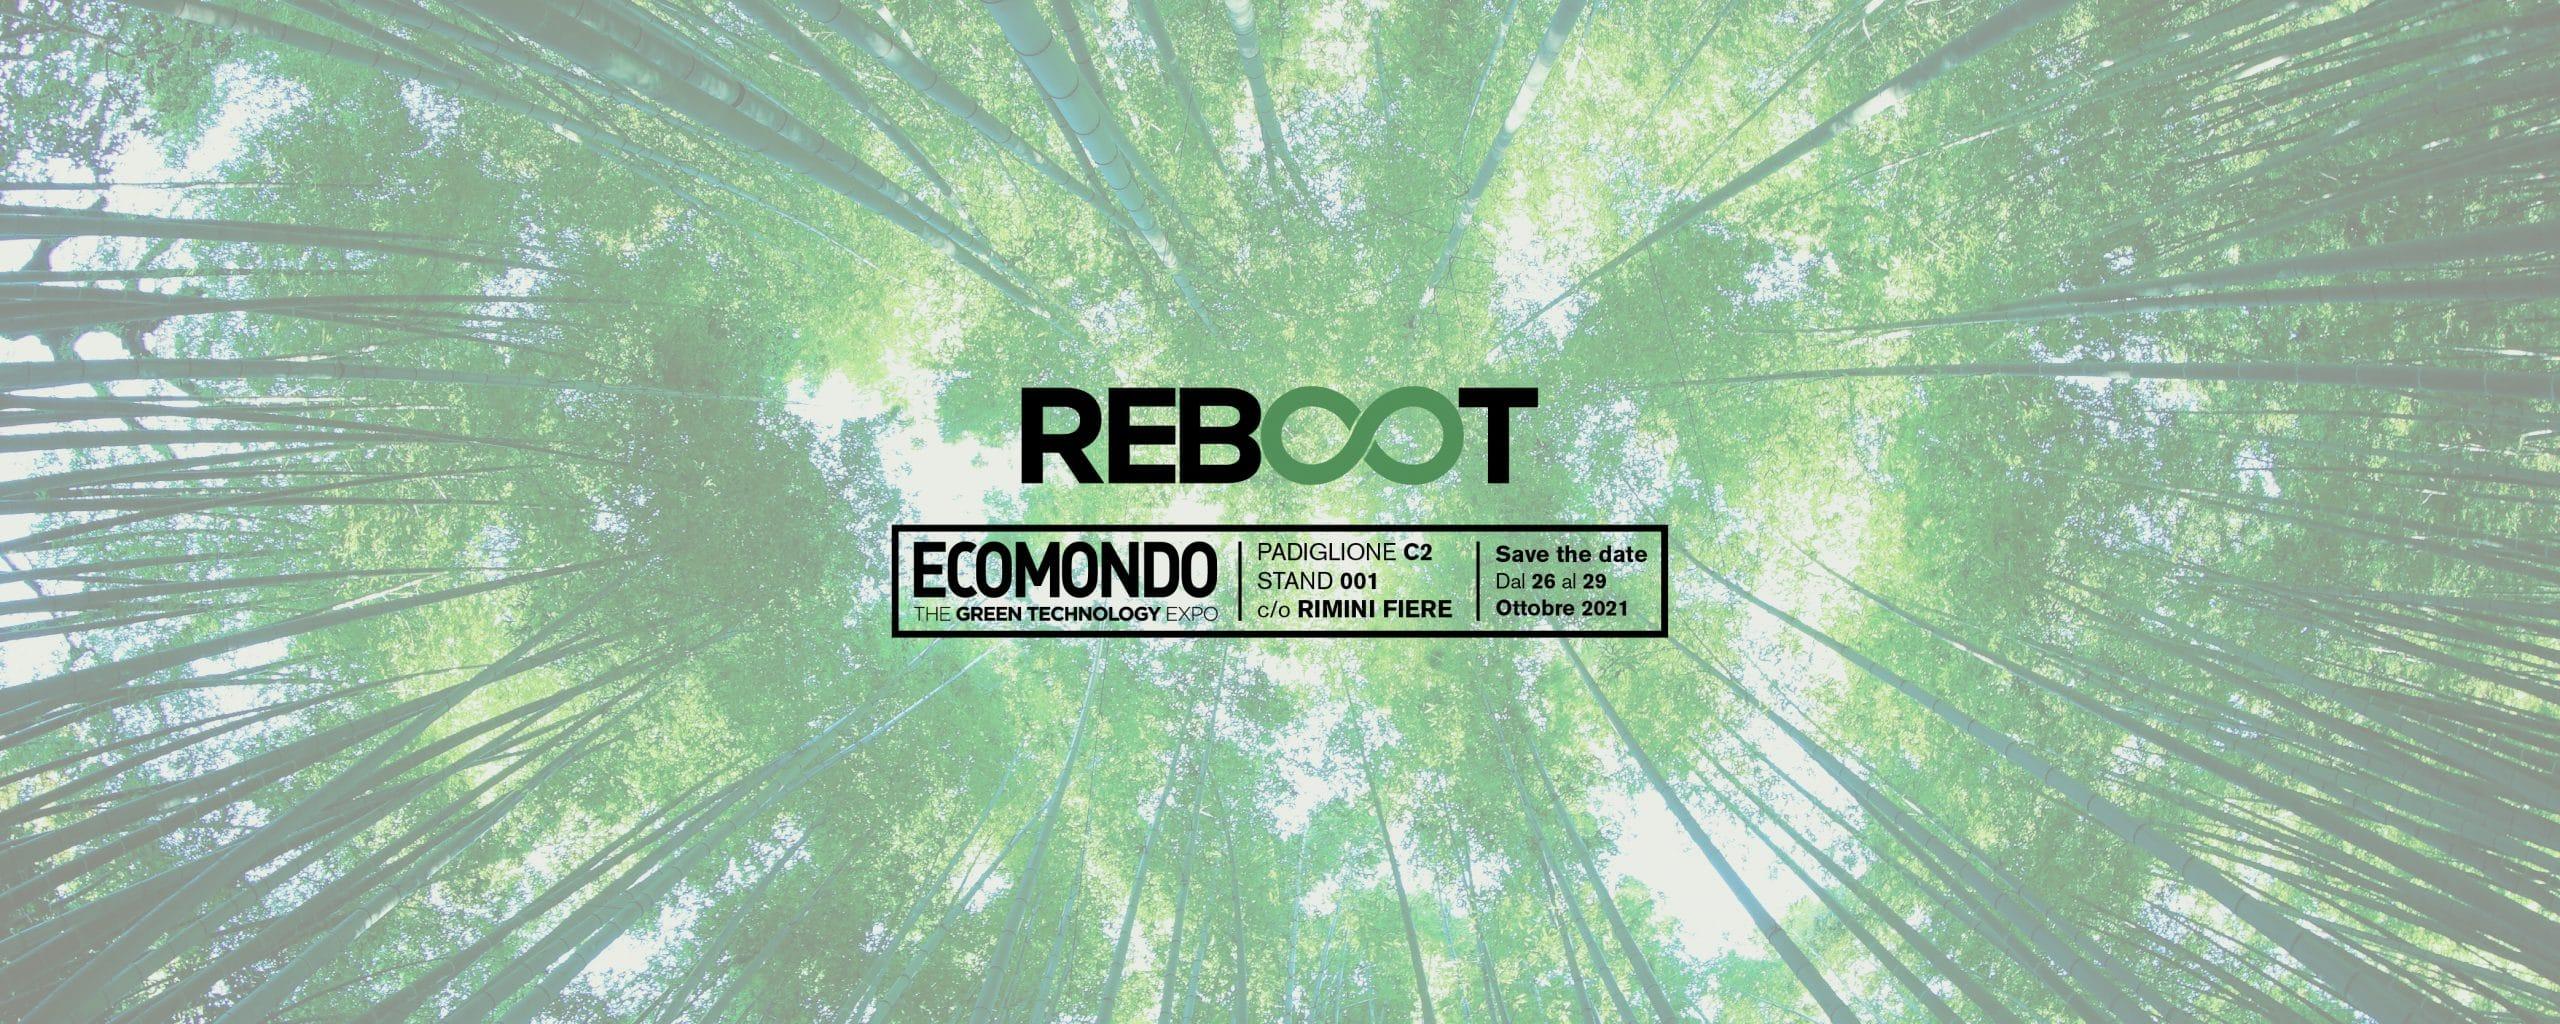 Garc Ecomondo 2021